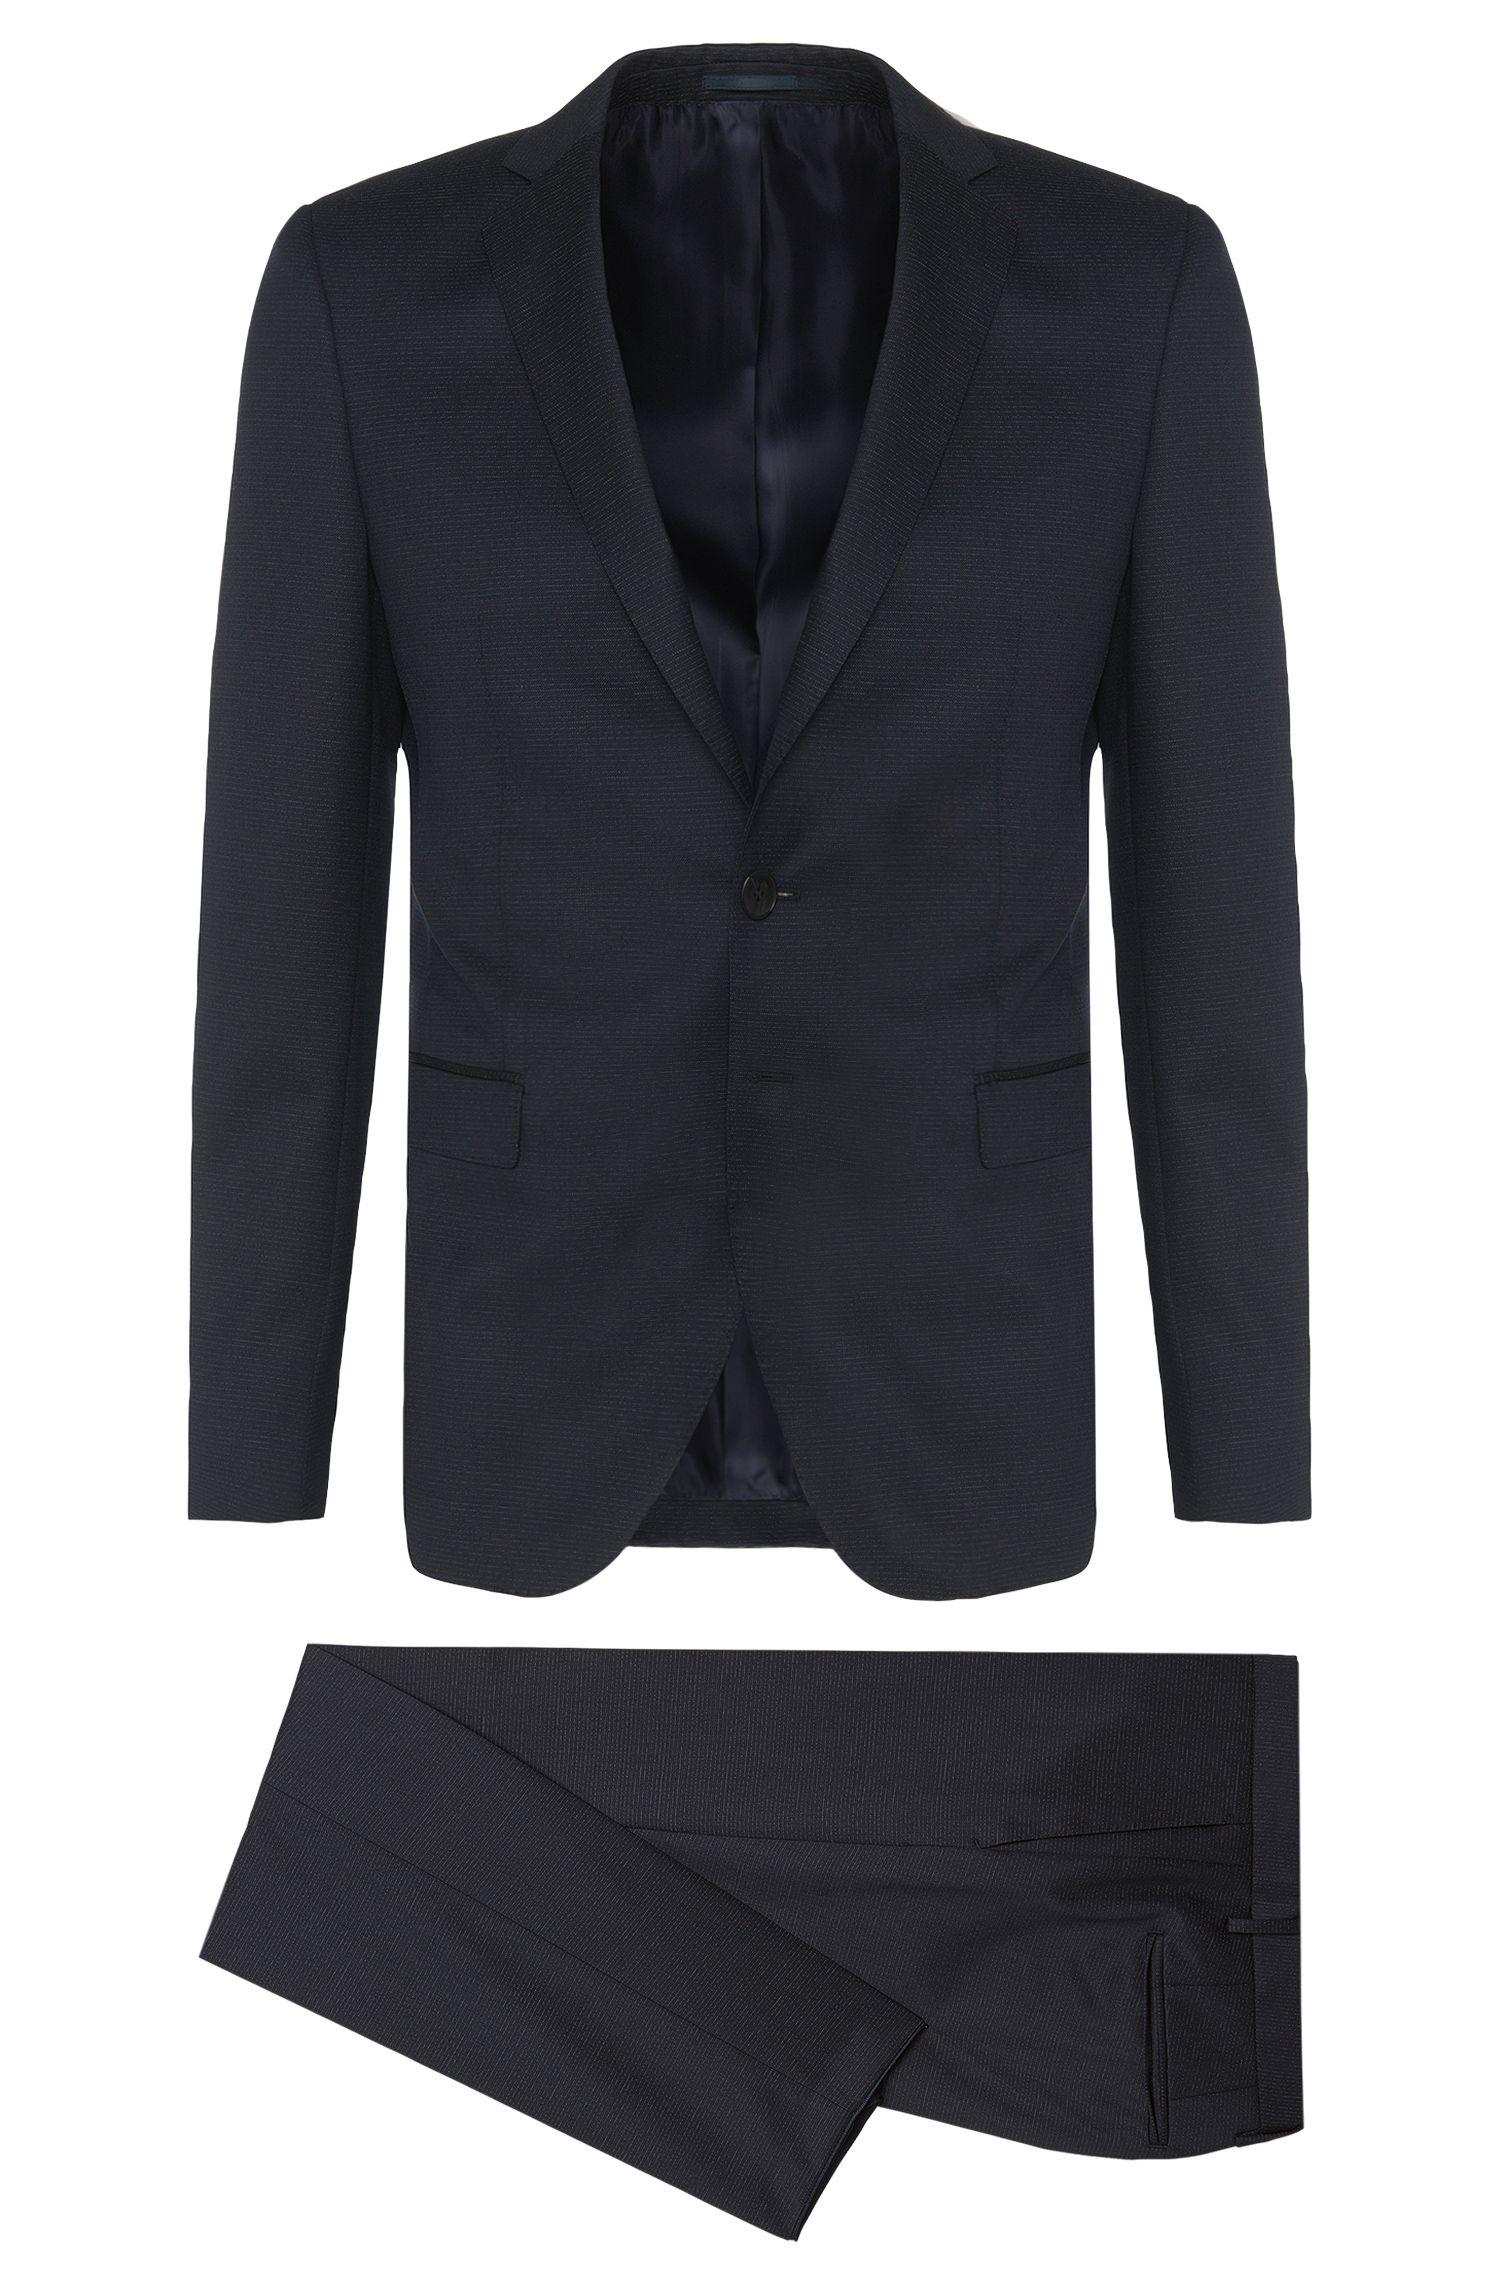 Subtle Stripe Virgin Wool Suit, Extra Slim Fit | Rocco/Wyatt